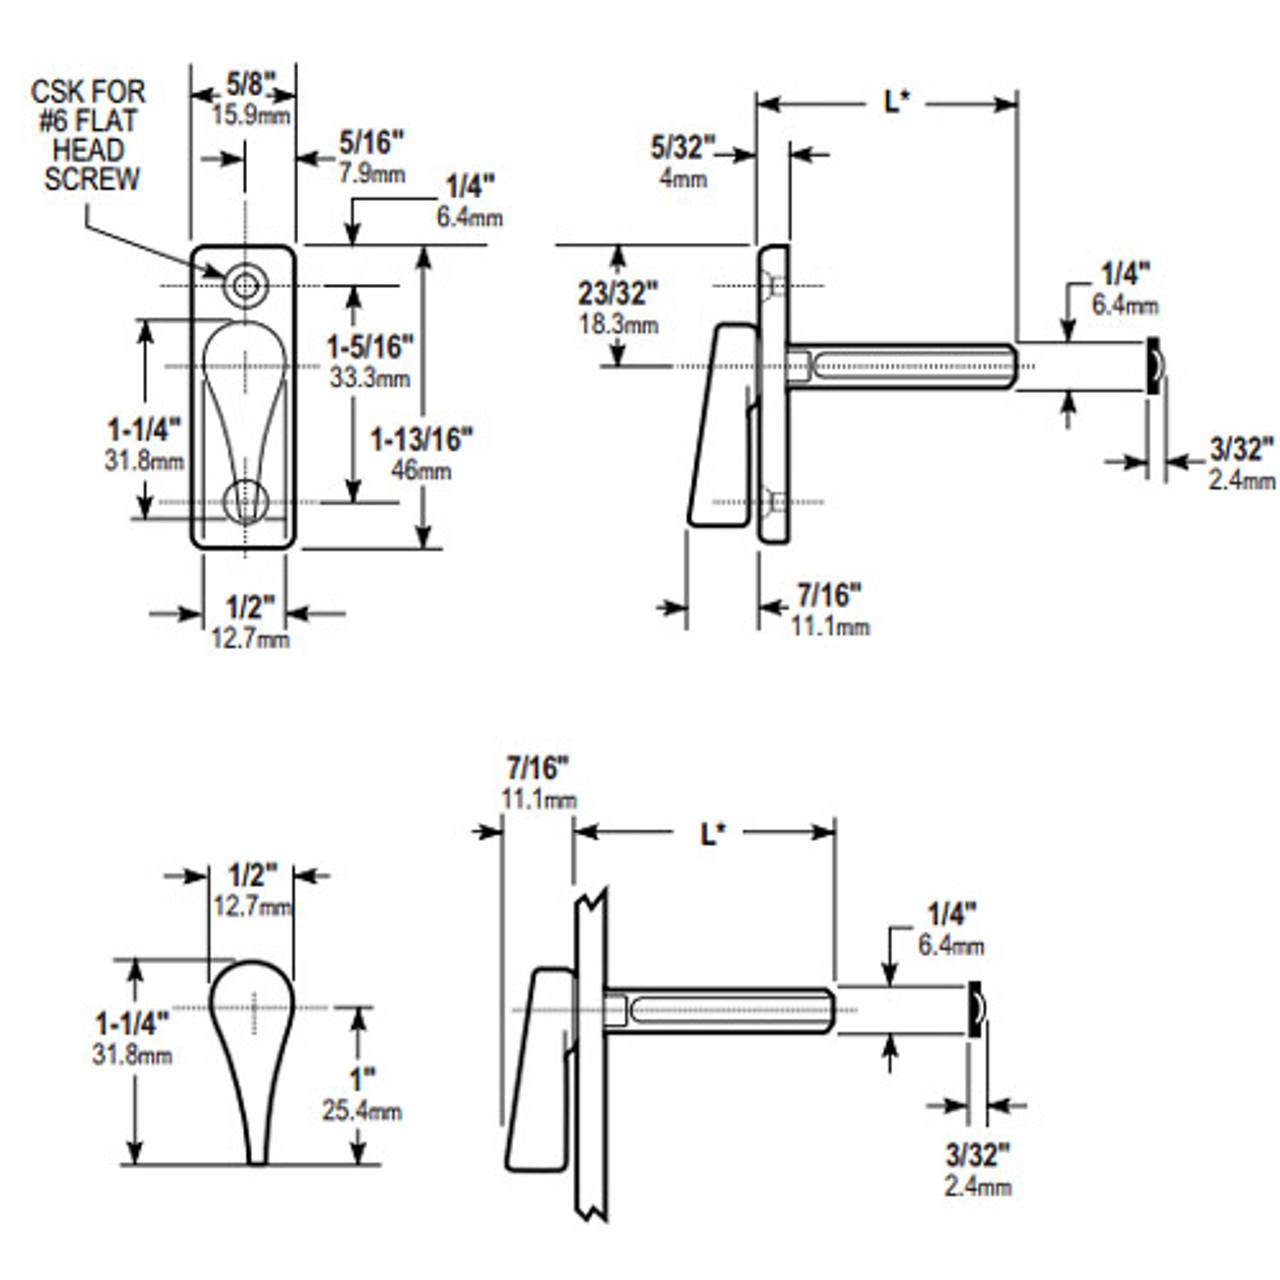 1000-02-14-119 Adams Rite 1000 Series Turns Dimensional View